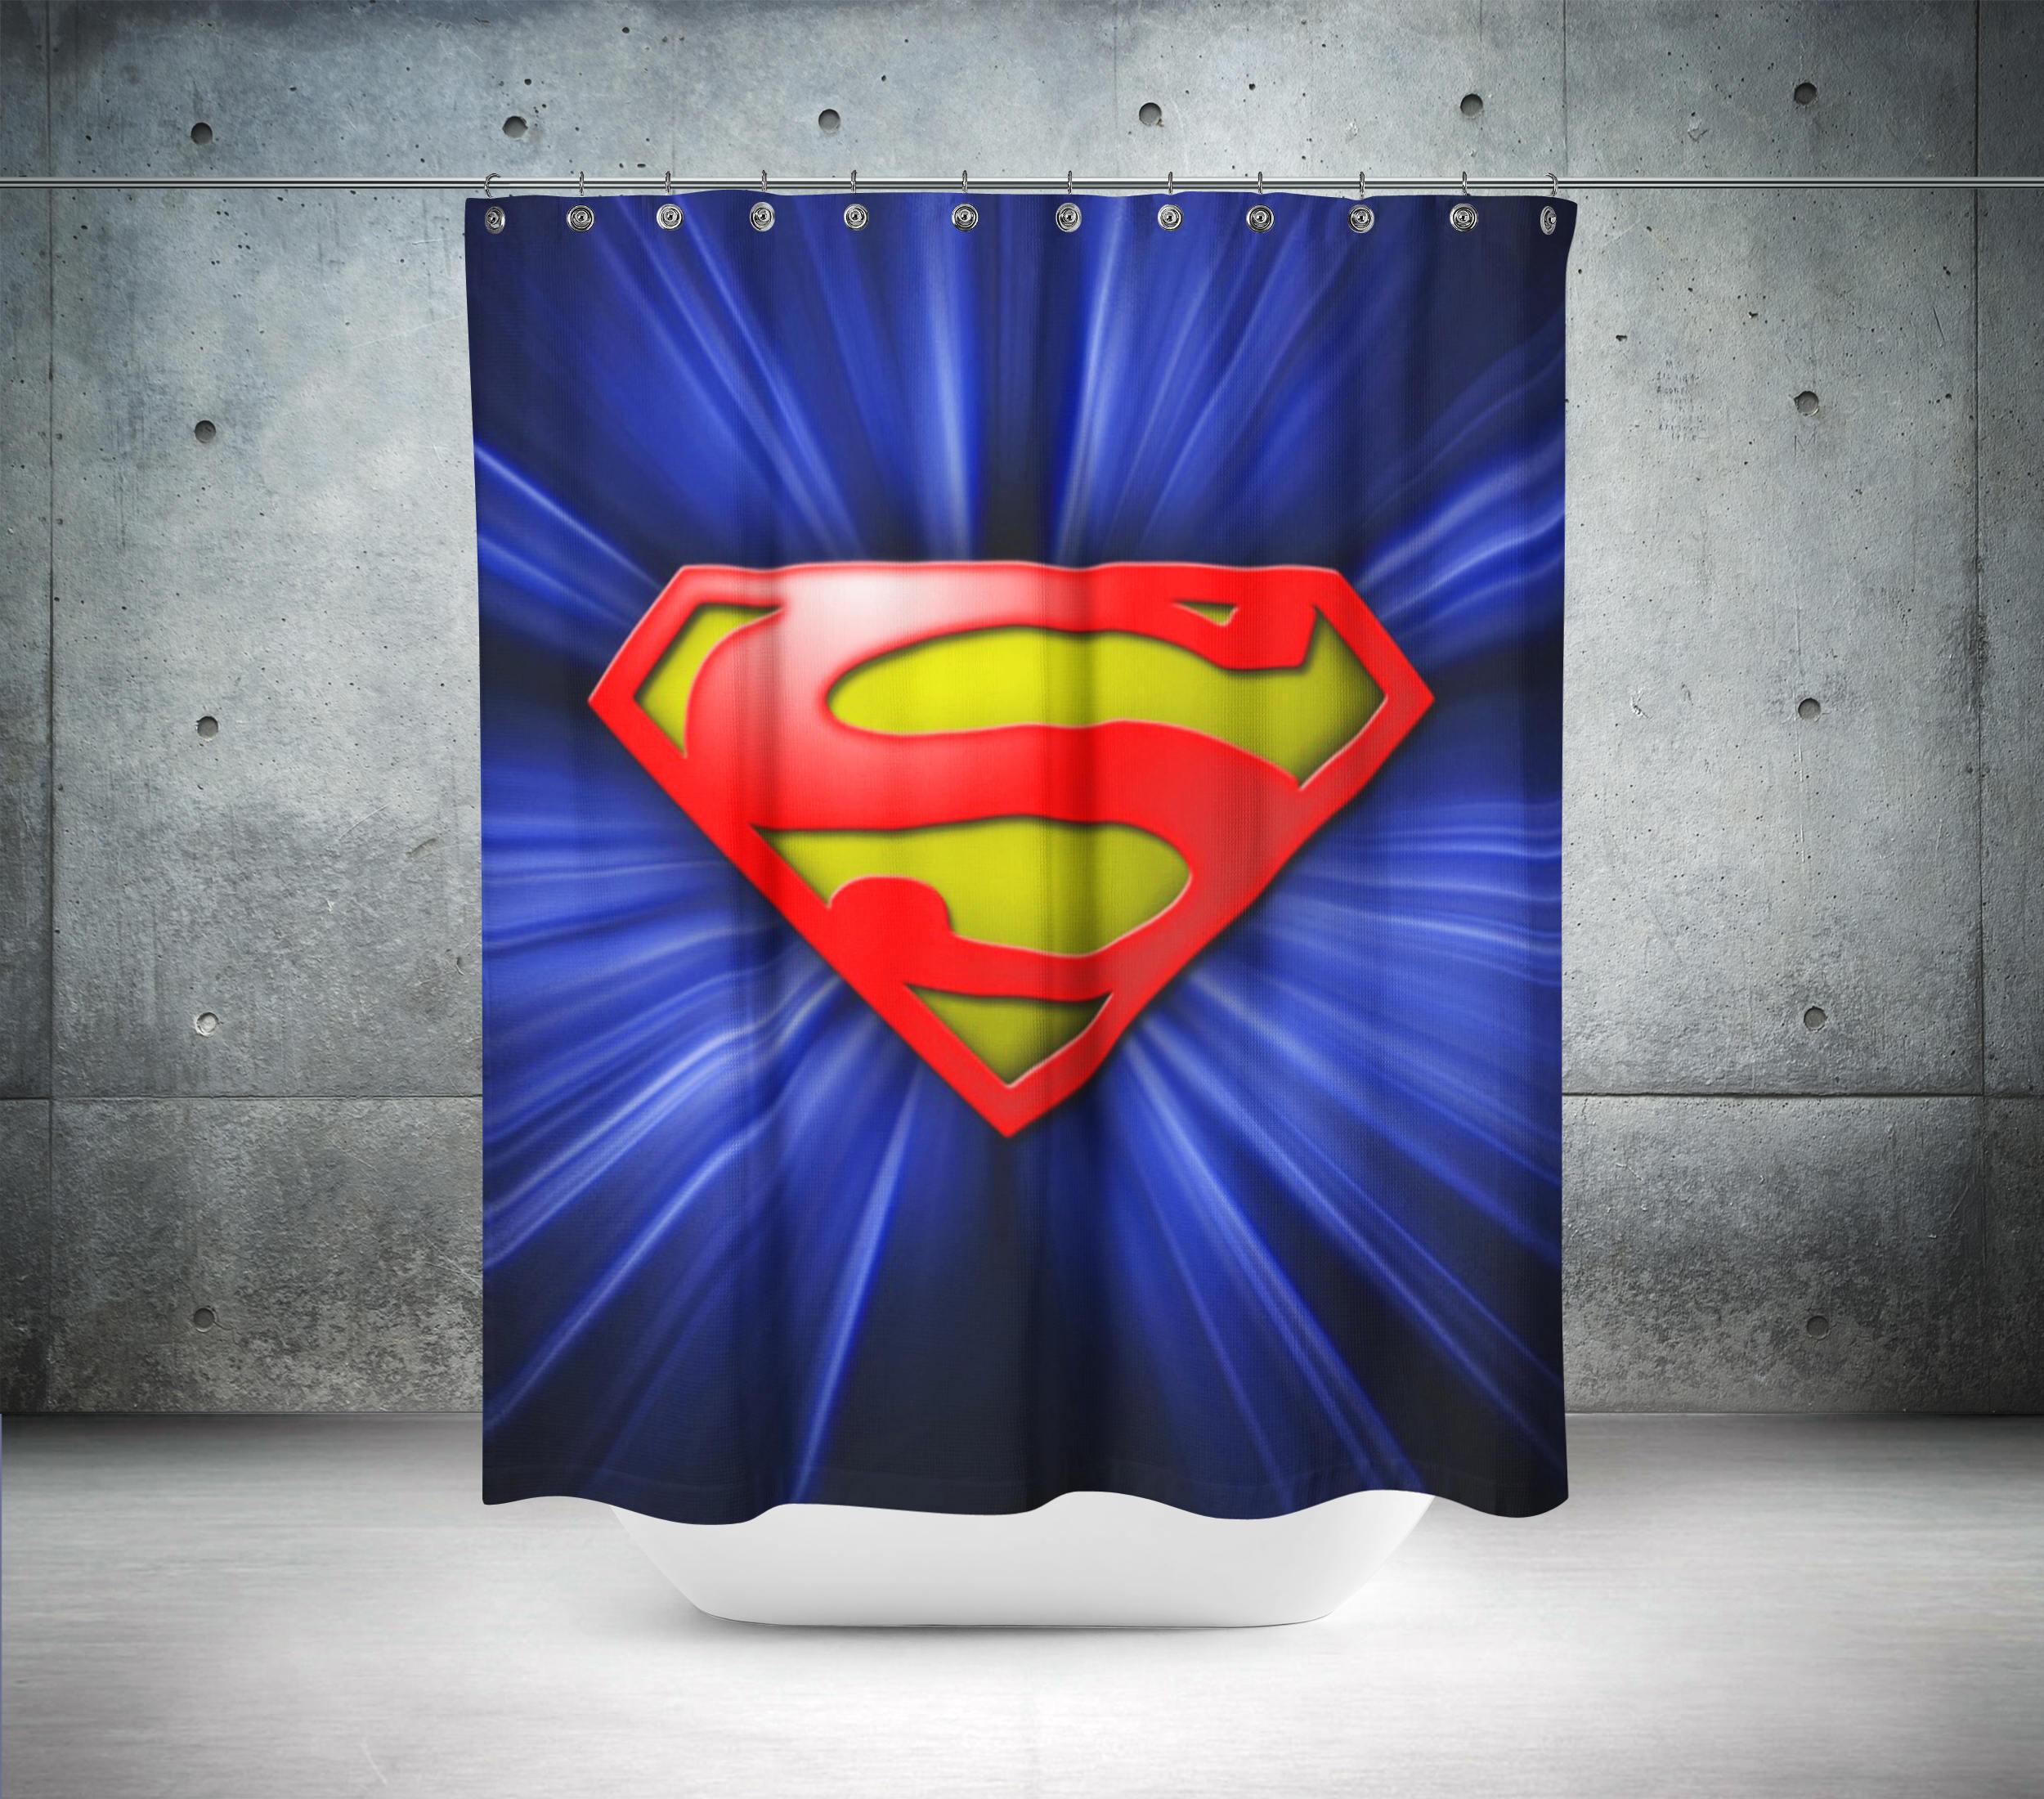 Superman Bathroom Decor: Superman Logo Shower Curtain On Storenvy